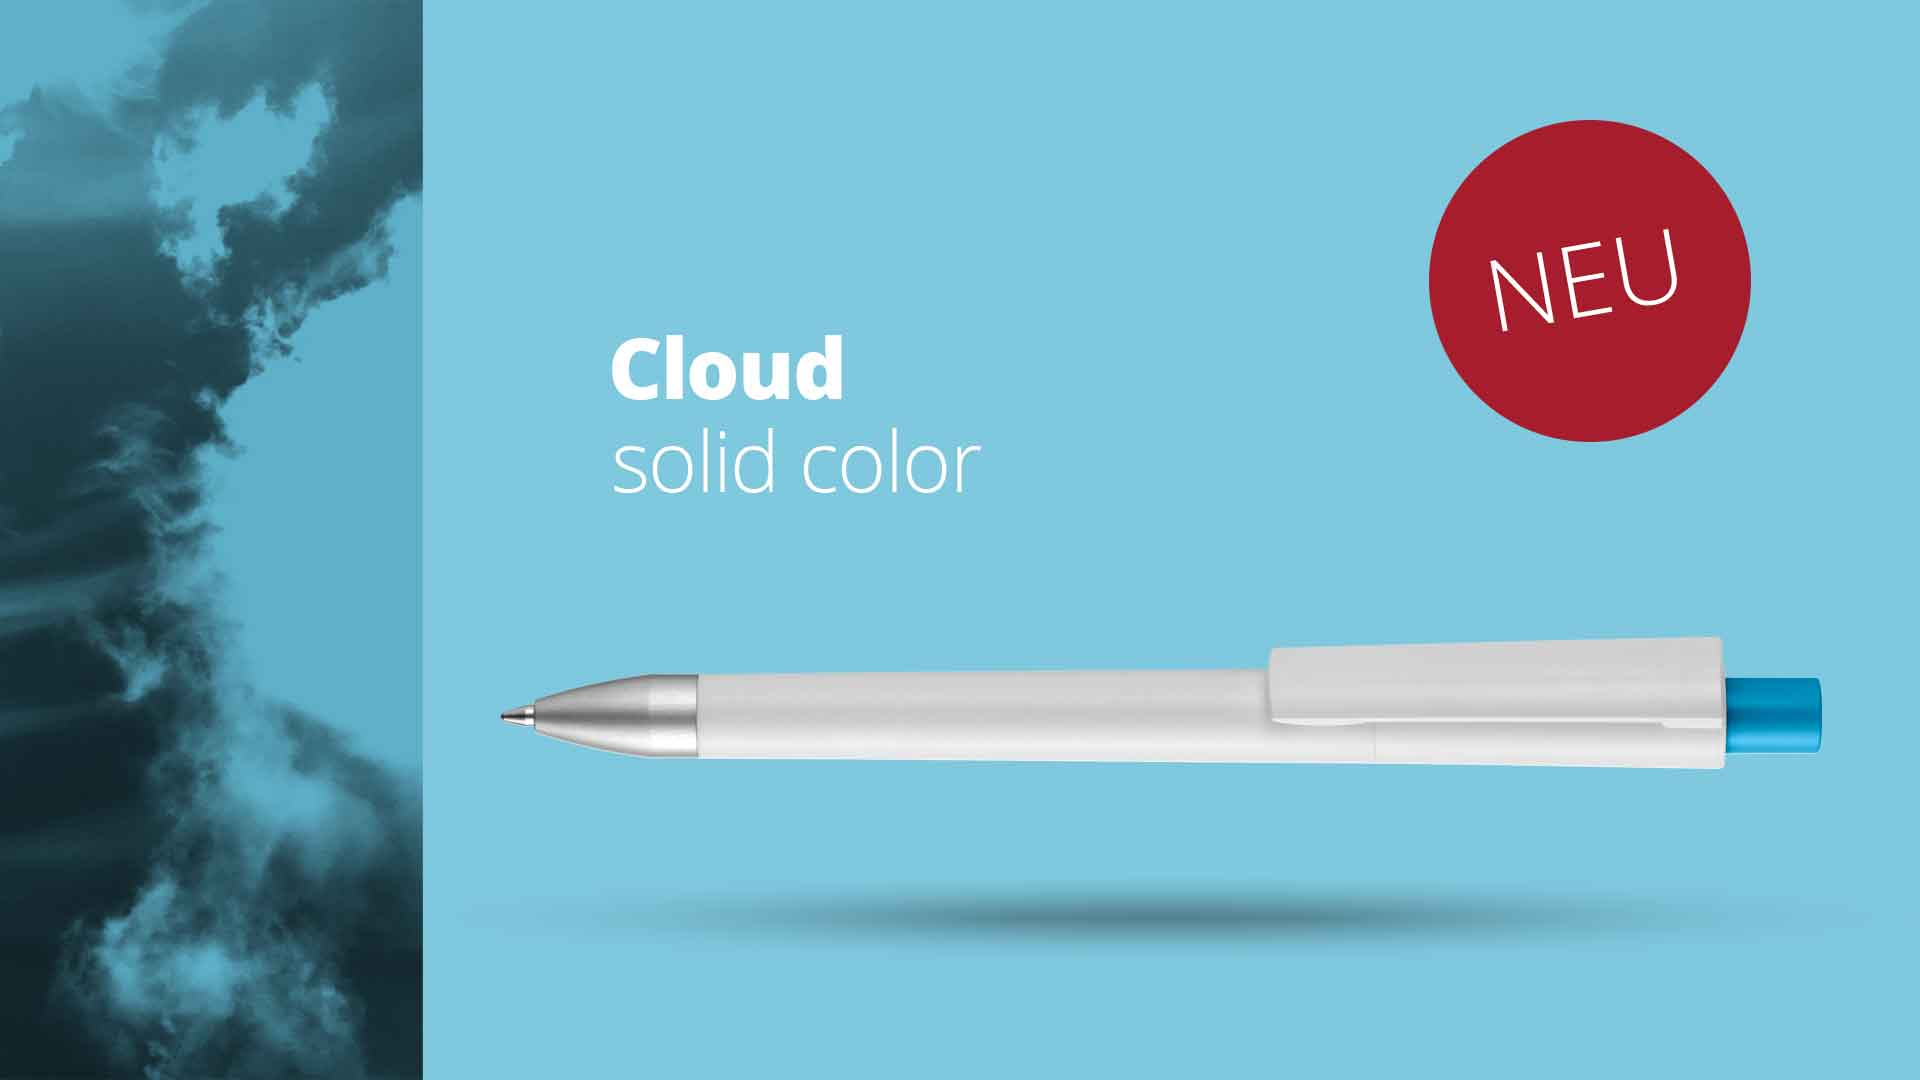 neu_01_cloud_desktop_010